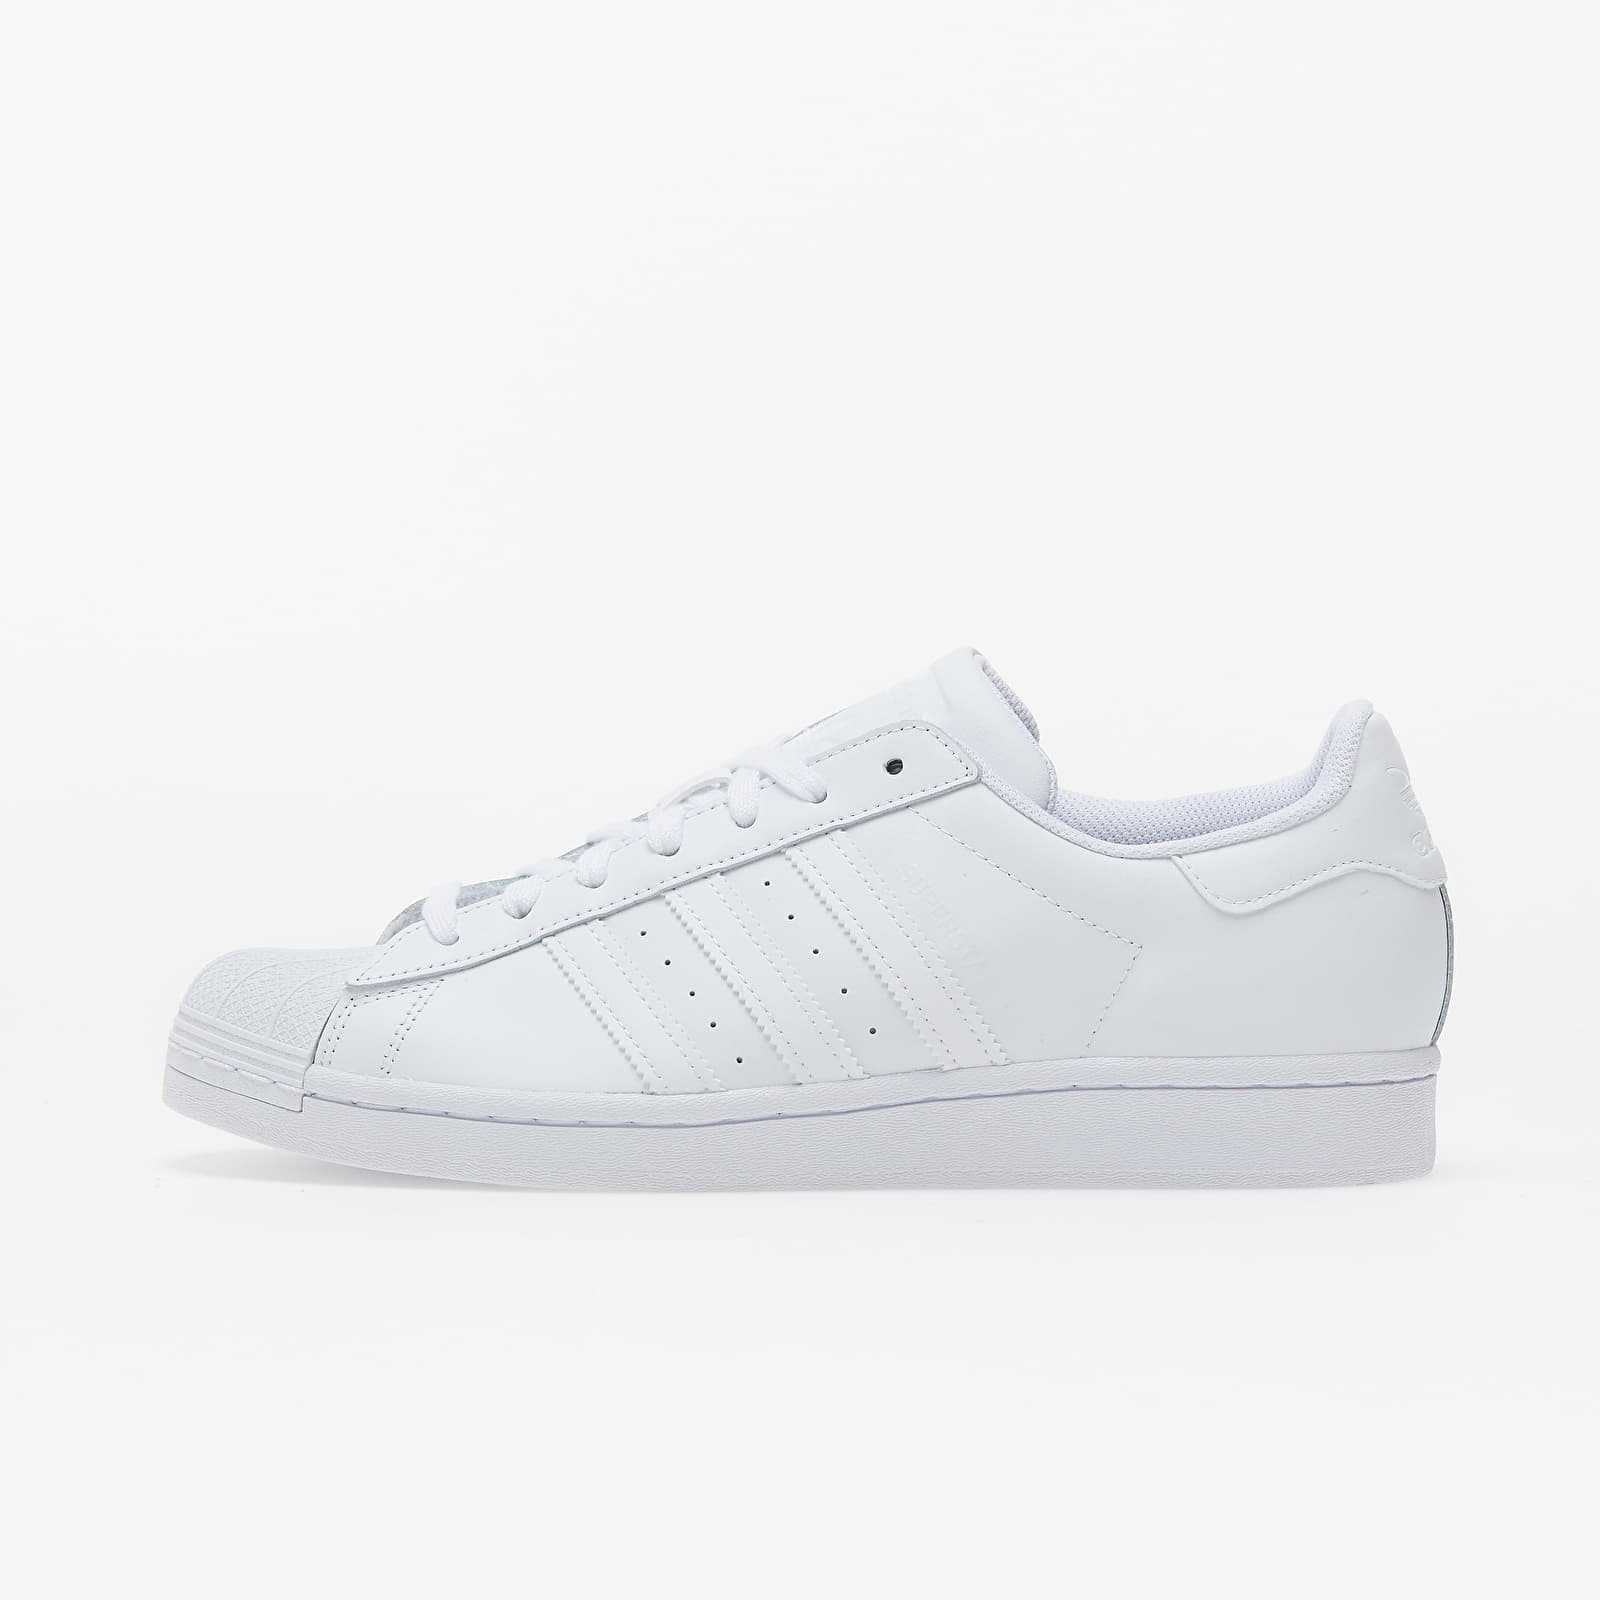 Férfi cipők adidas Superstar Ftw White/ Ftw White/ Ftw White